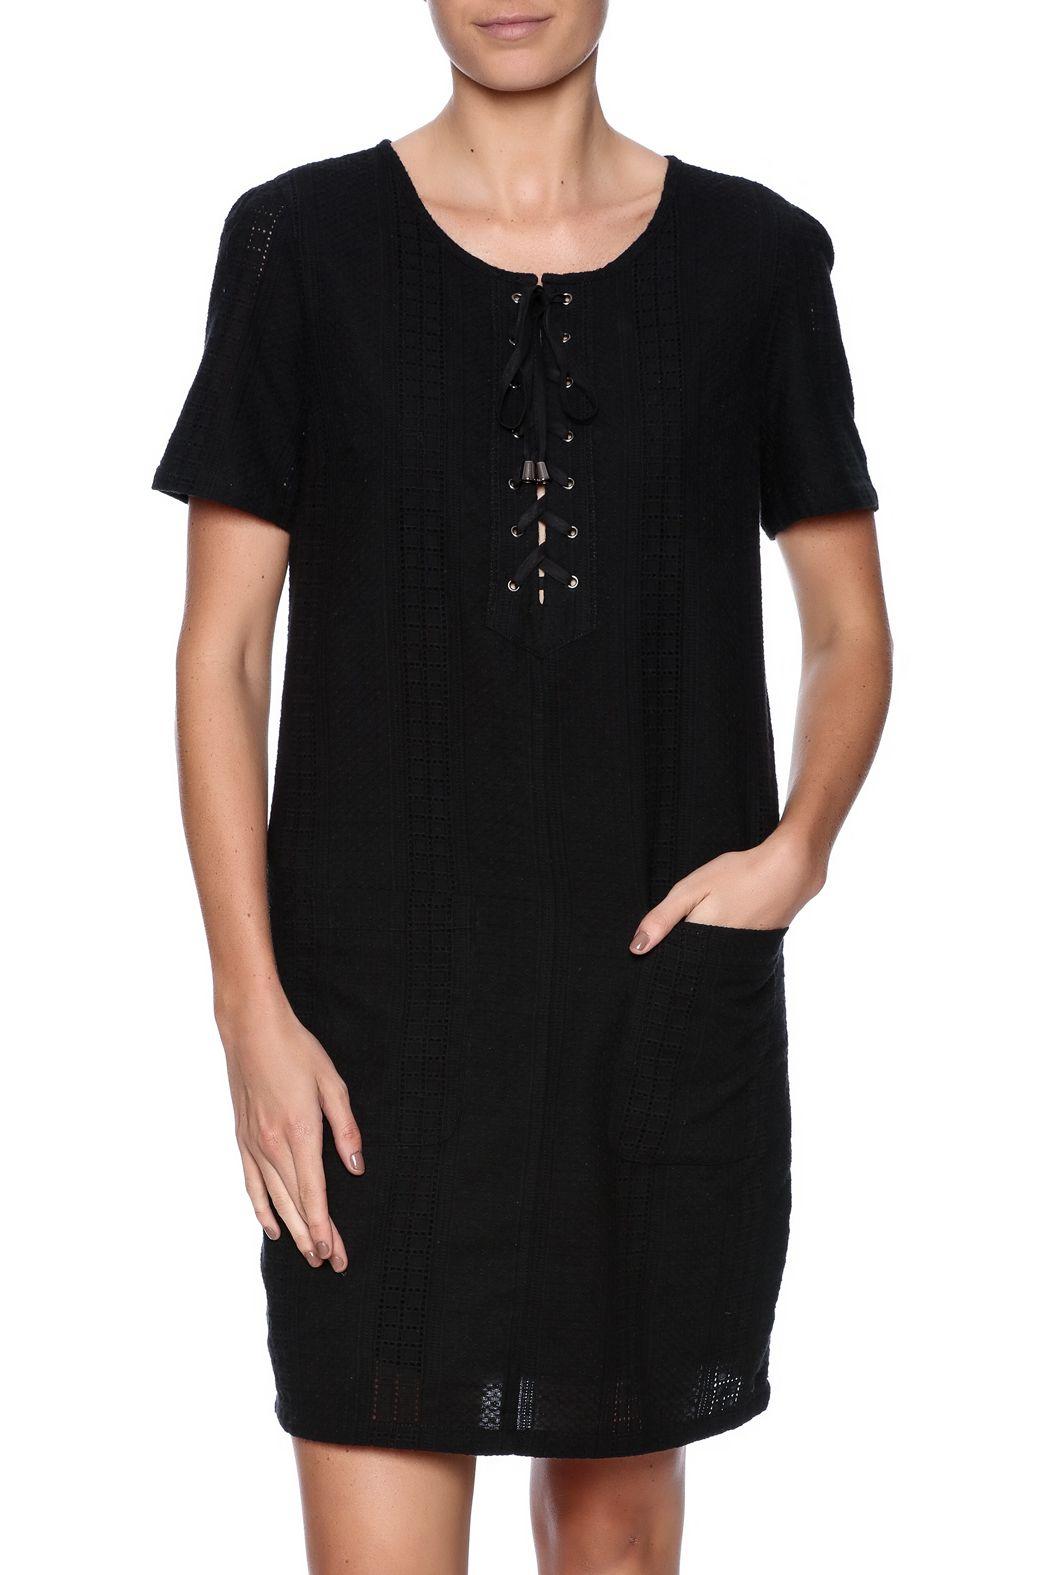 Kut from the kloth cotton eyelet dress black sleeved dresses